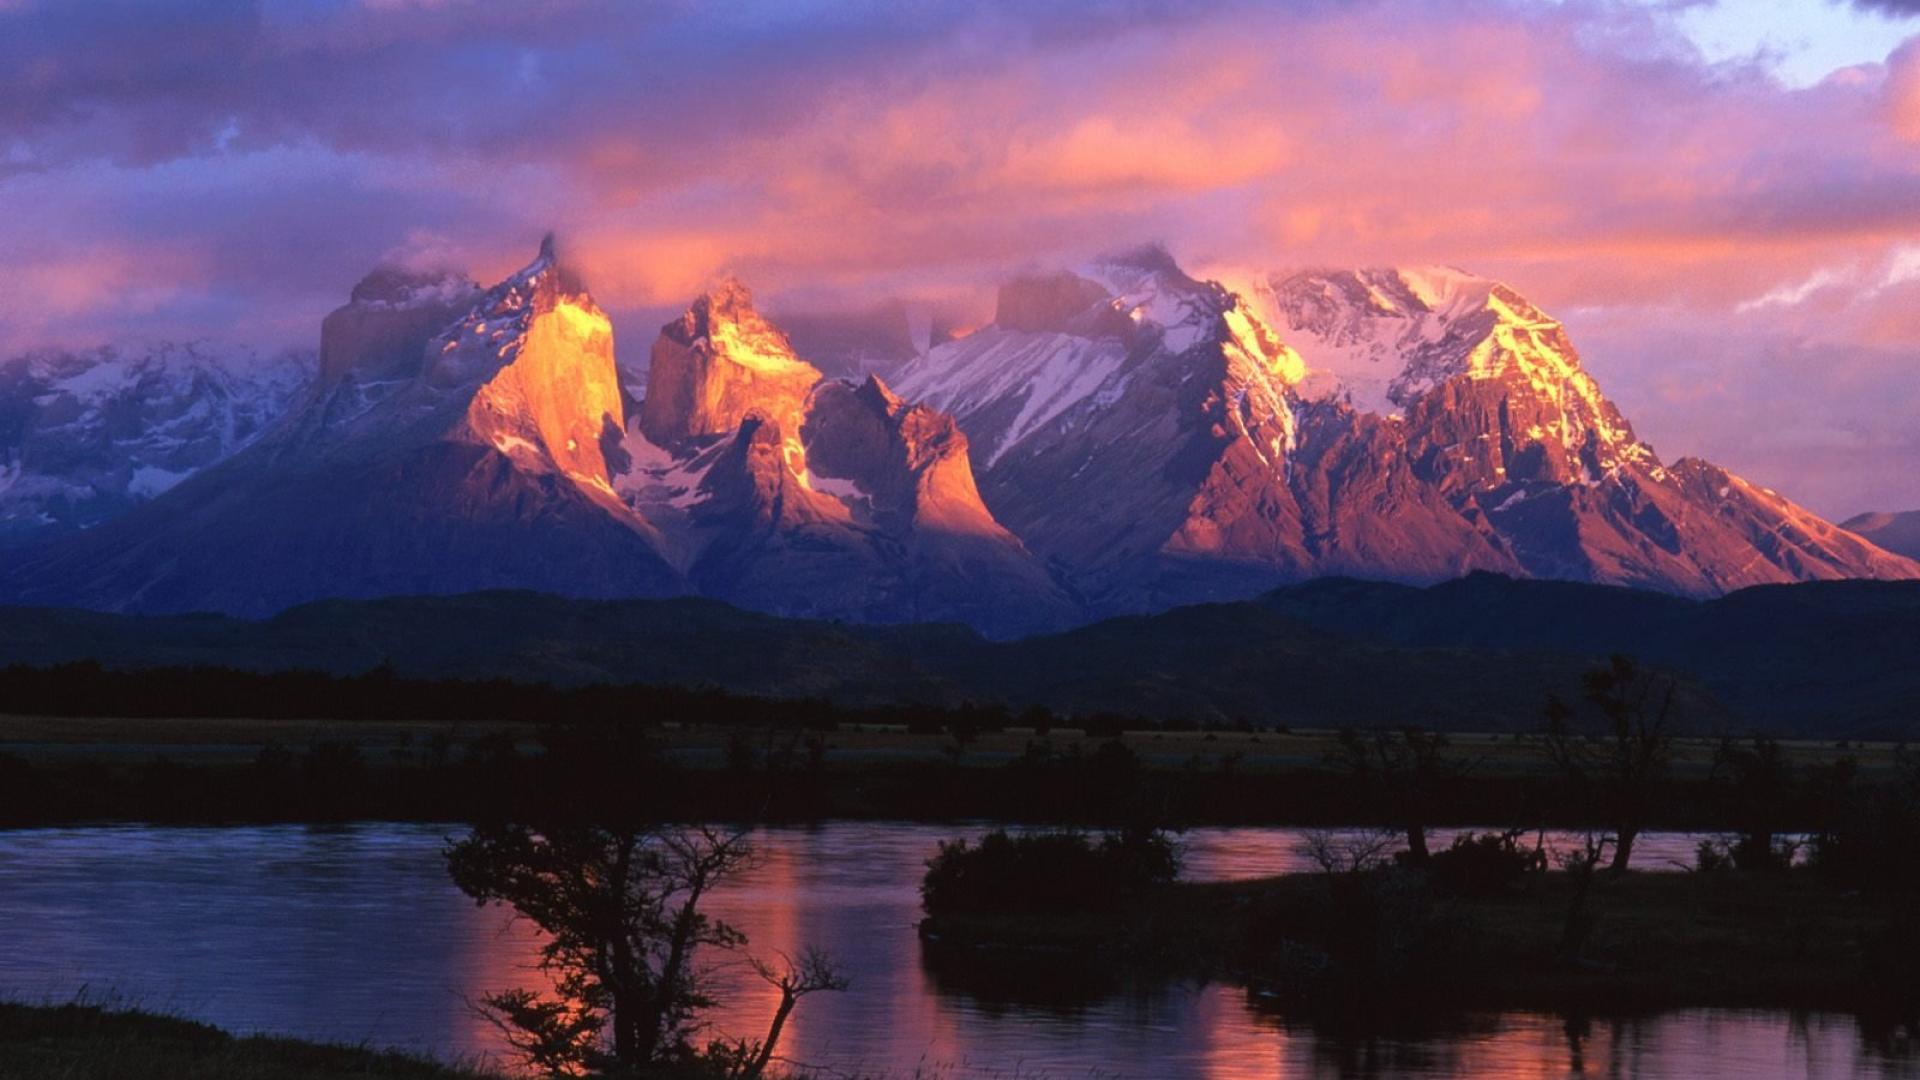 patagonia torres del paine chile america wallpaper HD Argentina: una terra di emozioni